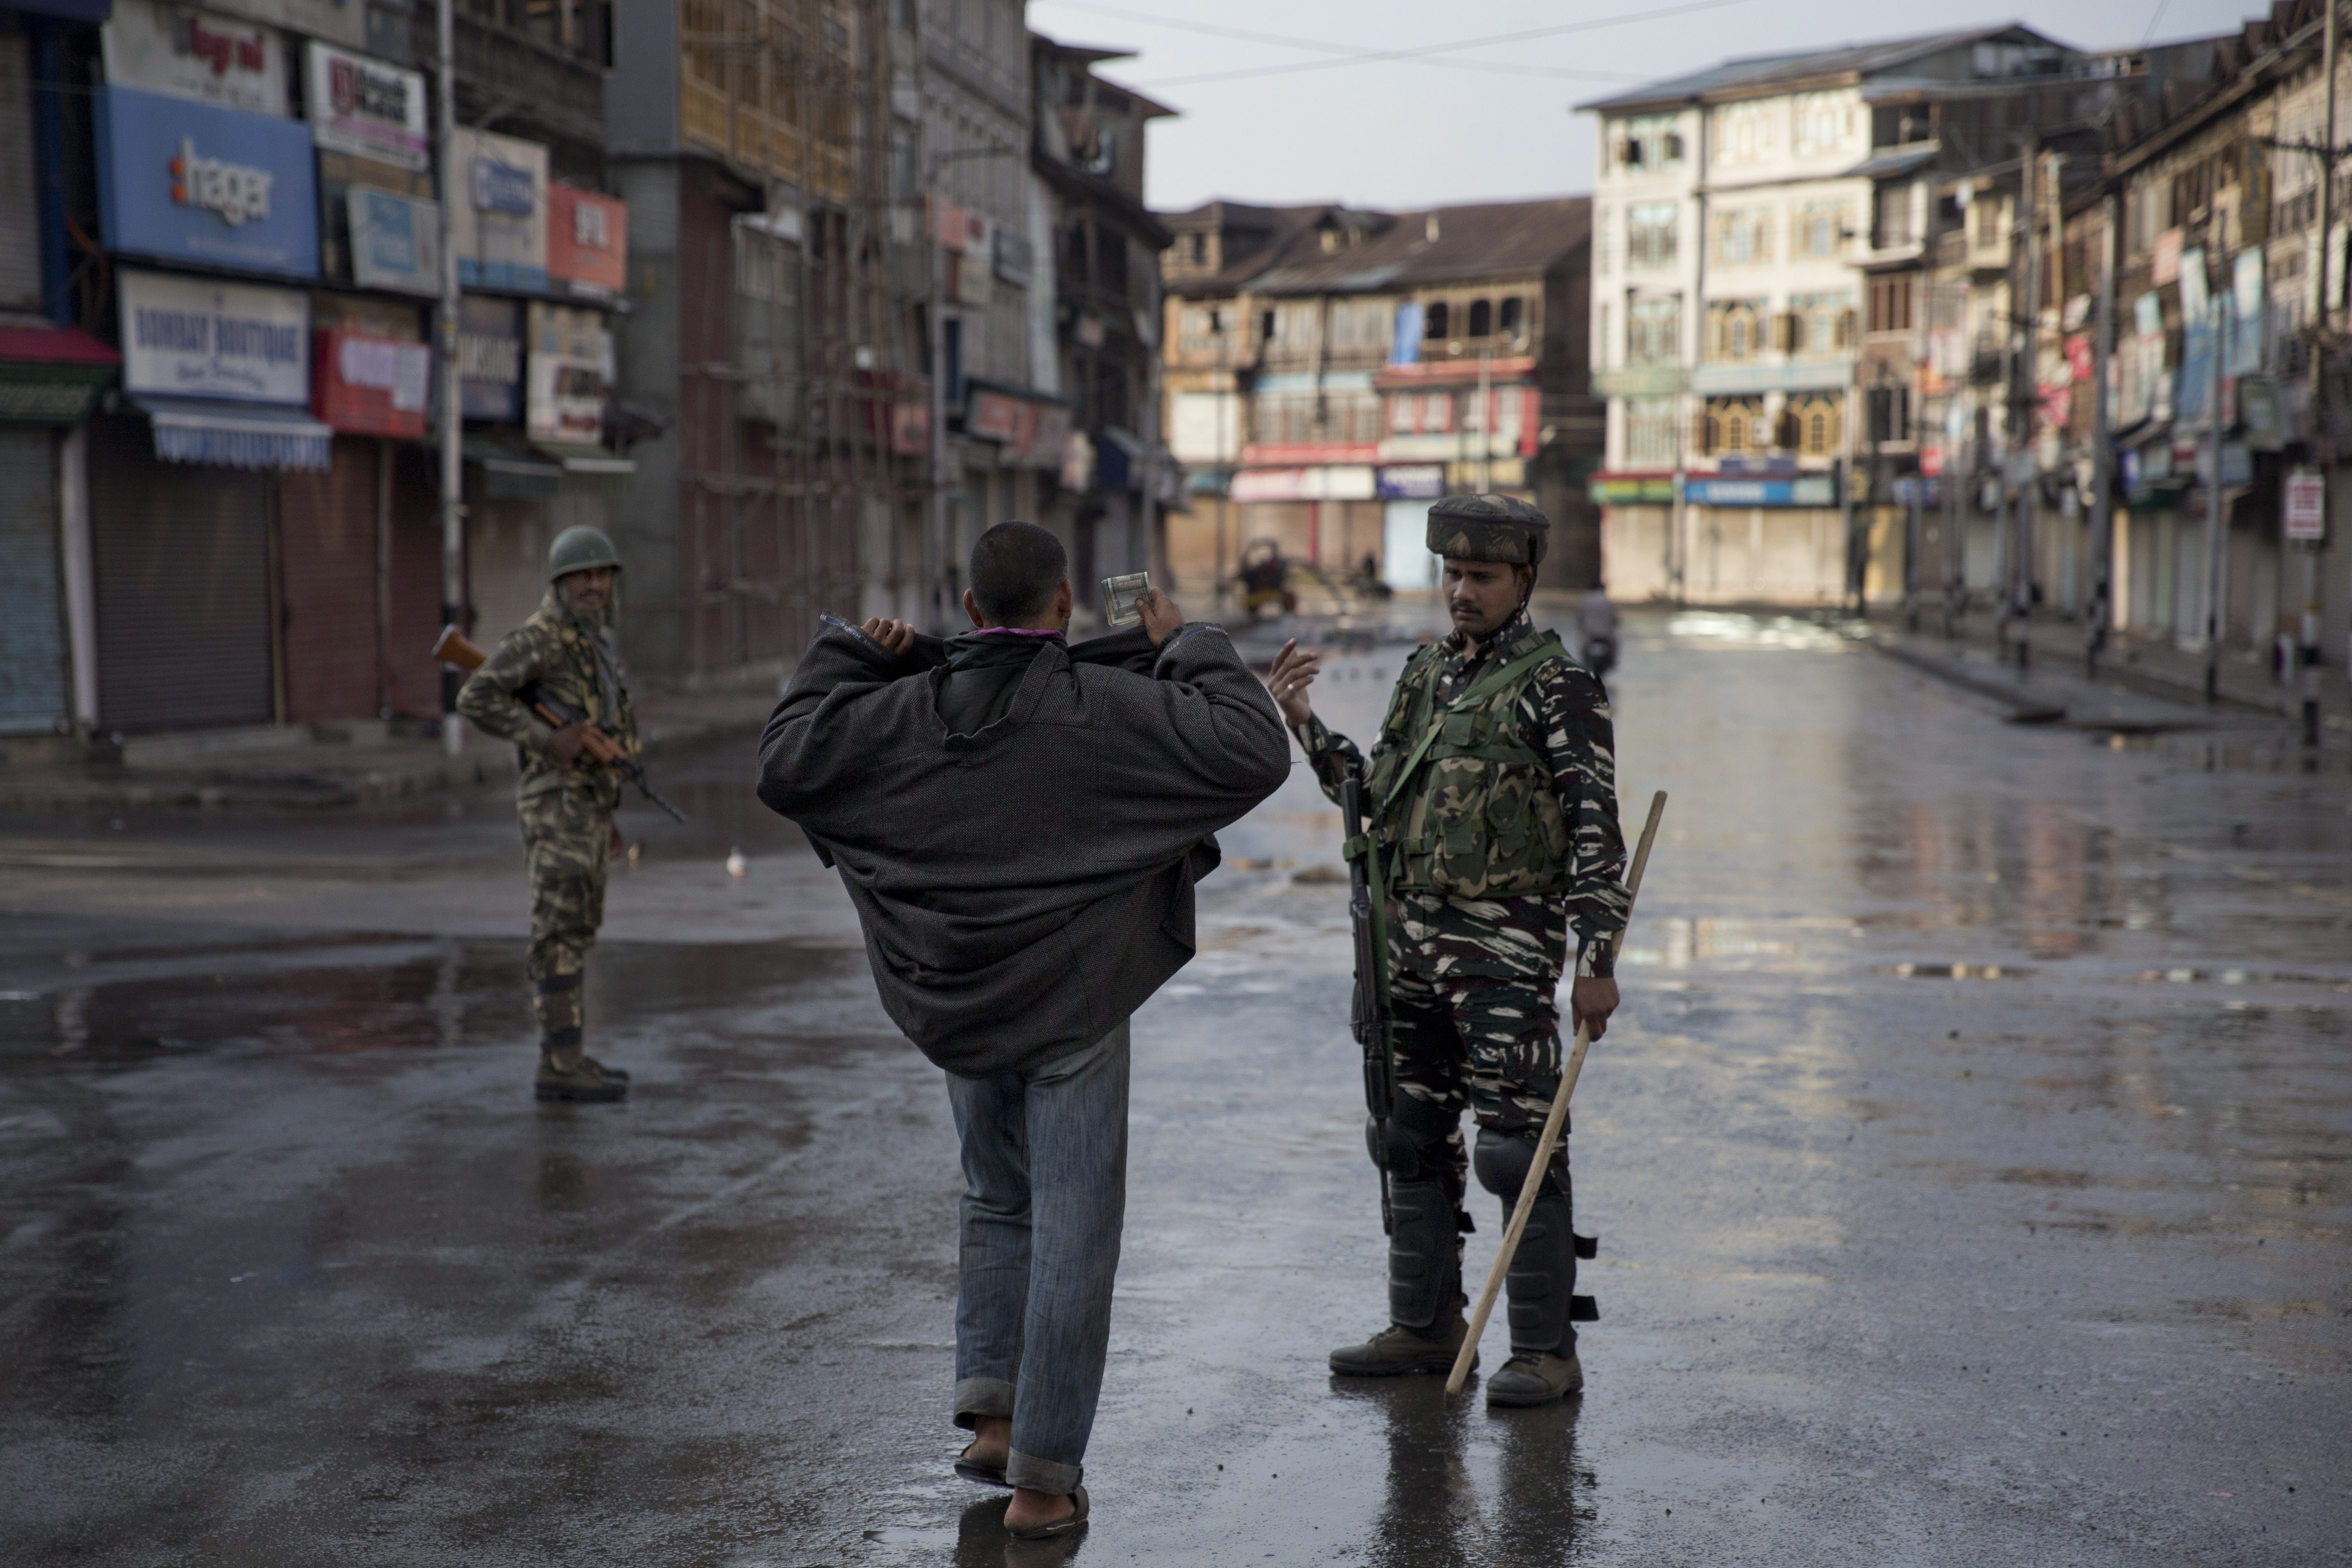 Kashmir curfew partially eased for prayers amid lockdown | CTV News